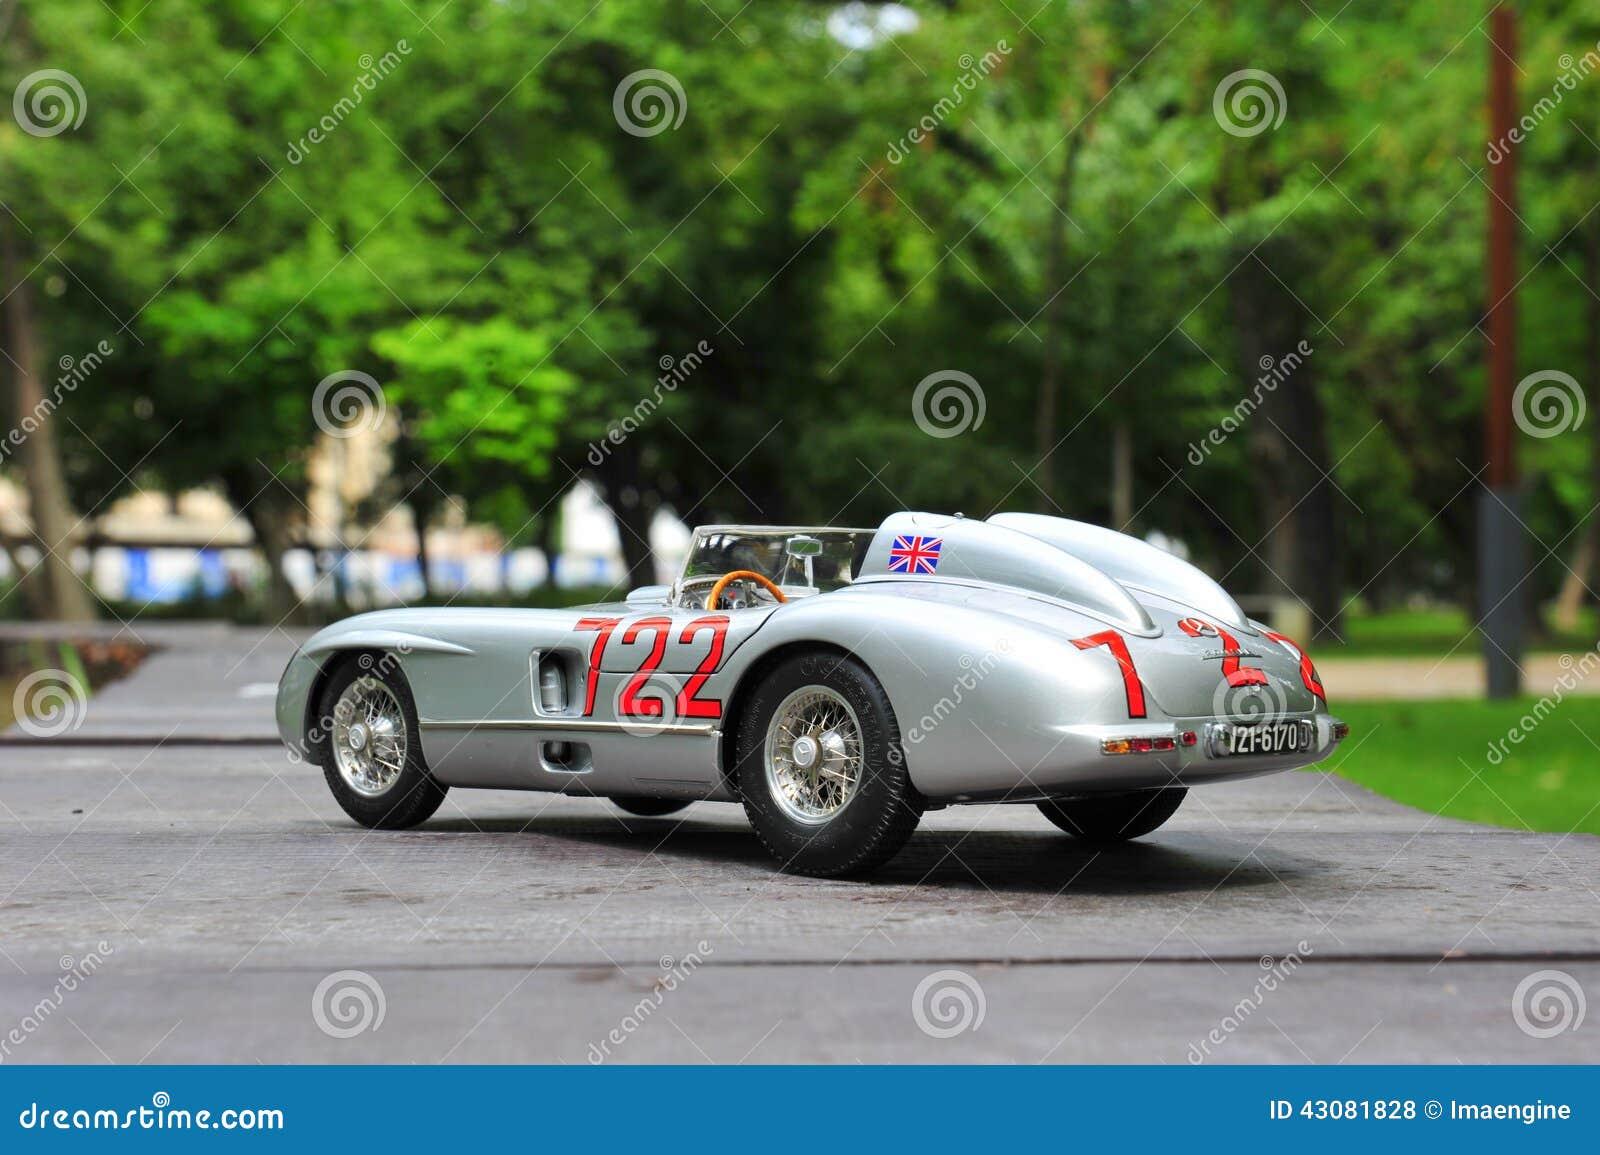 Mercedes Benz Silver Arrow Bonita Conduzida Pelo Motorista Famoso Stirling  Moss Na Raça De Mille Miglia